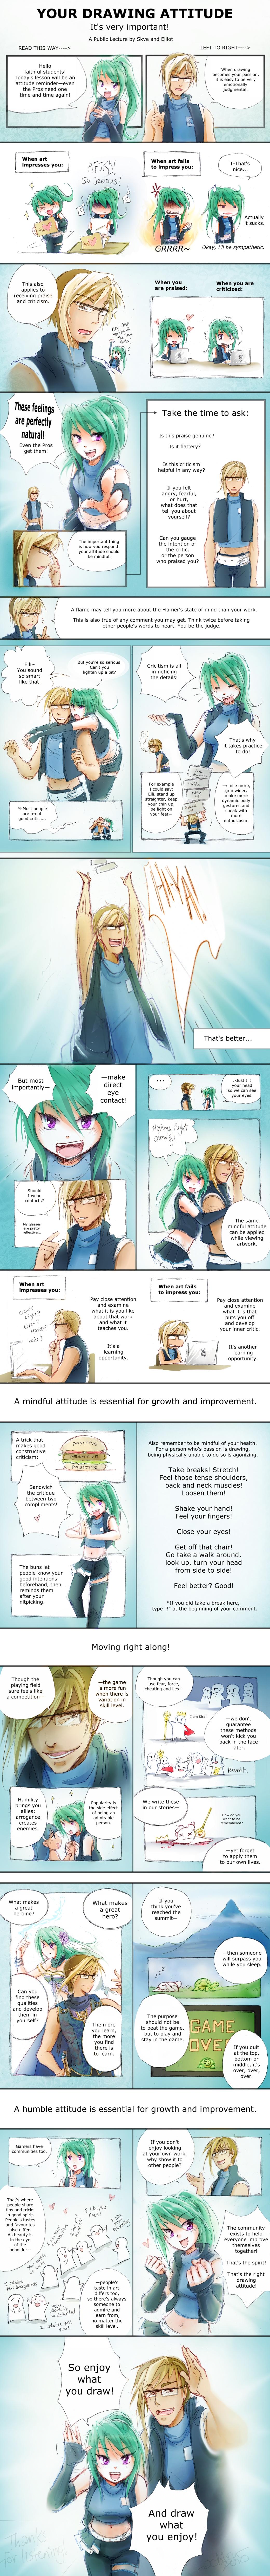 Your Drawing Attitude by Achiru-et-al